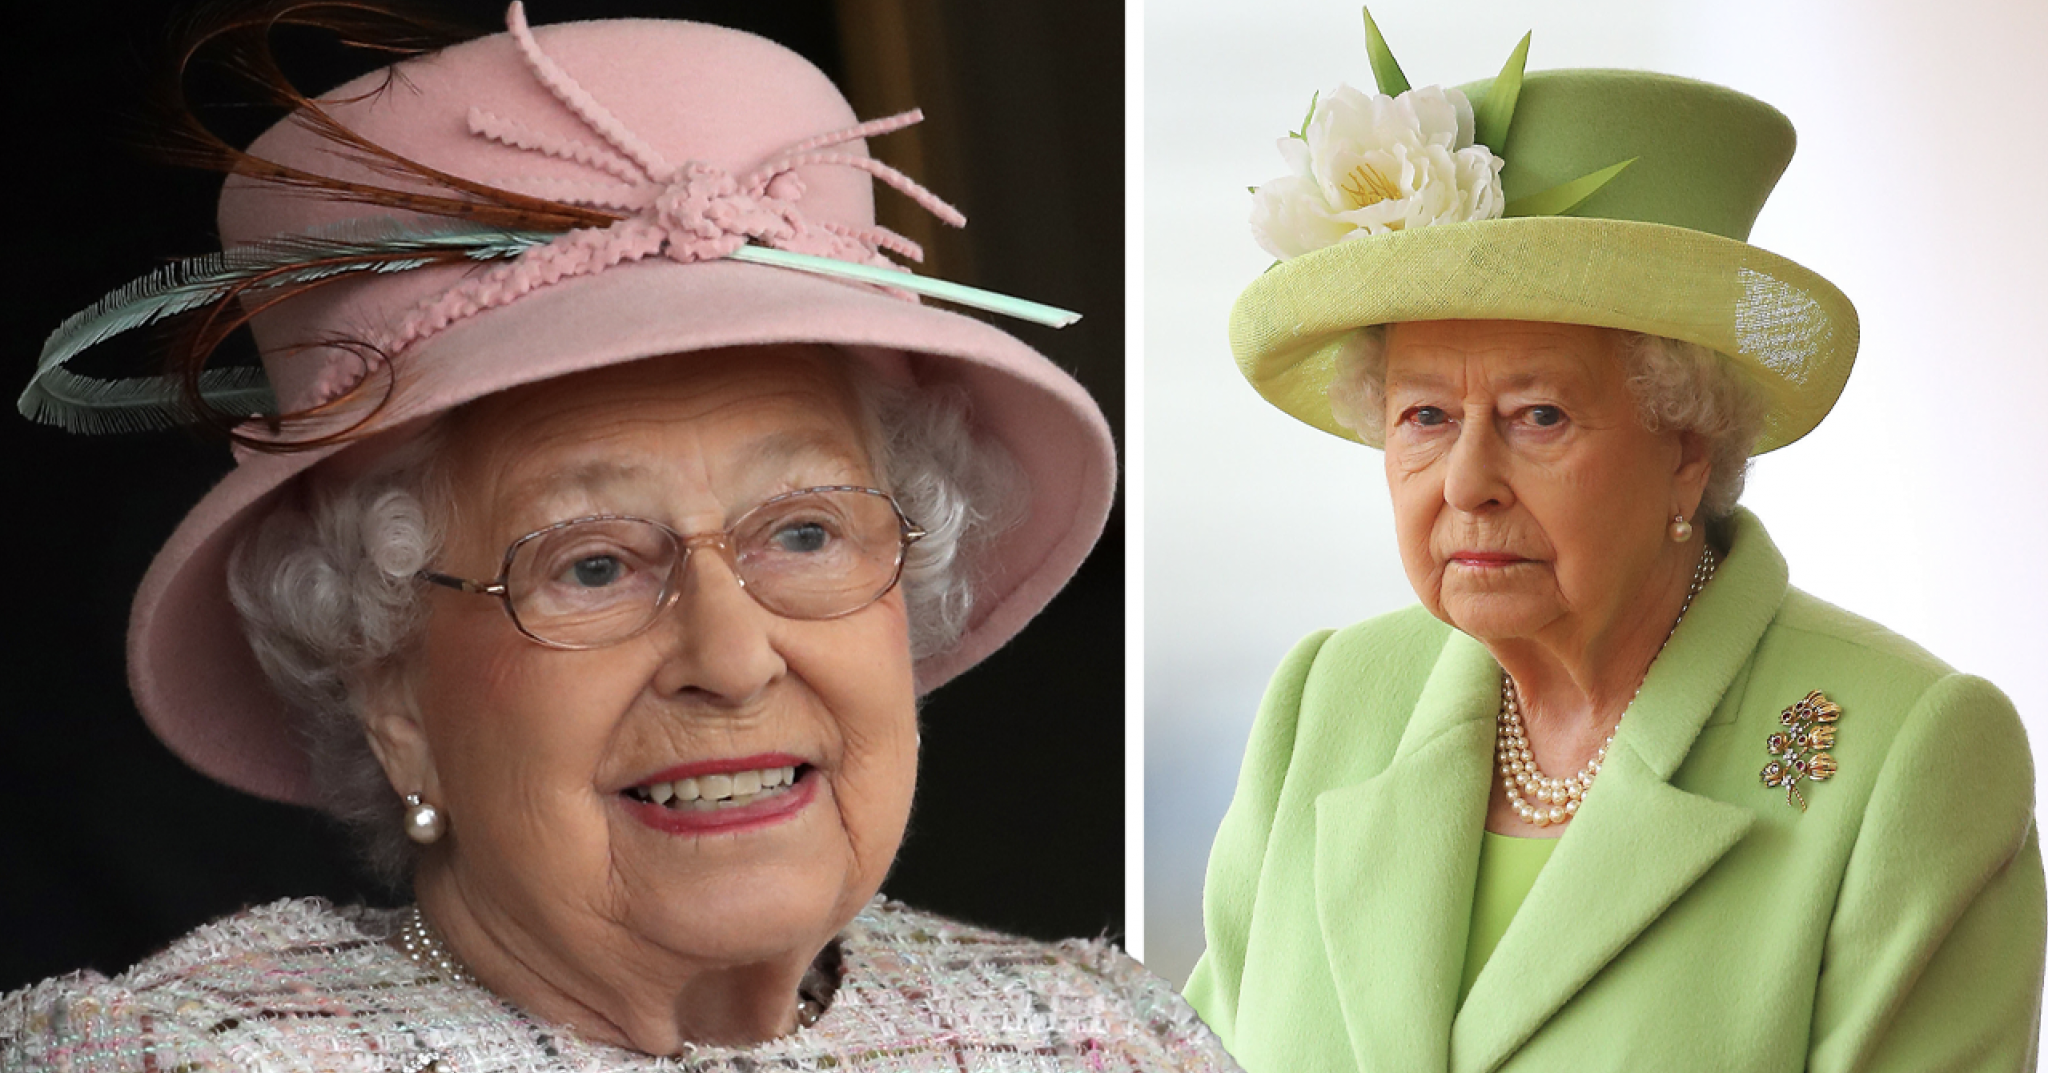 Drottning Elizabeth kan tvingas avgå – stora oron